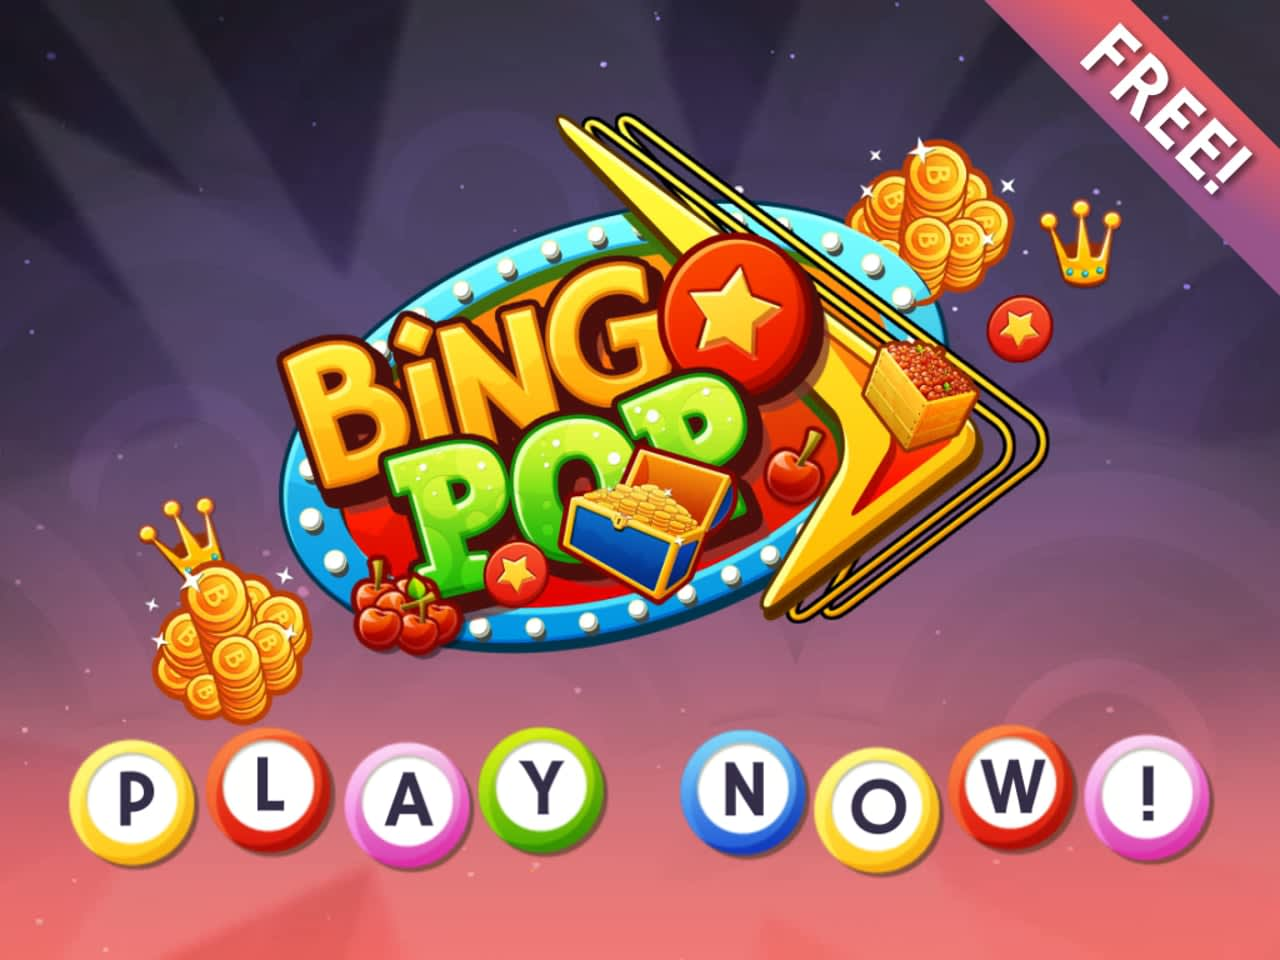 Bingo Pop Animation